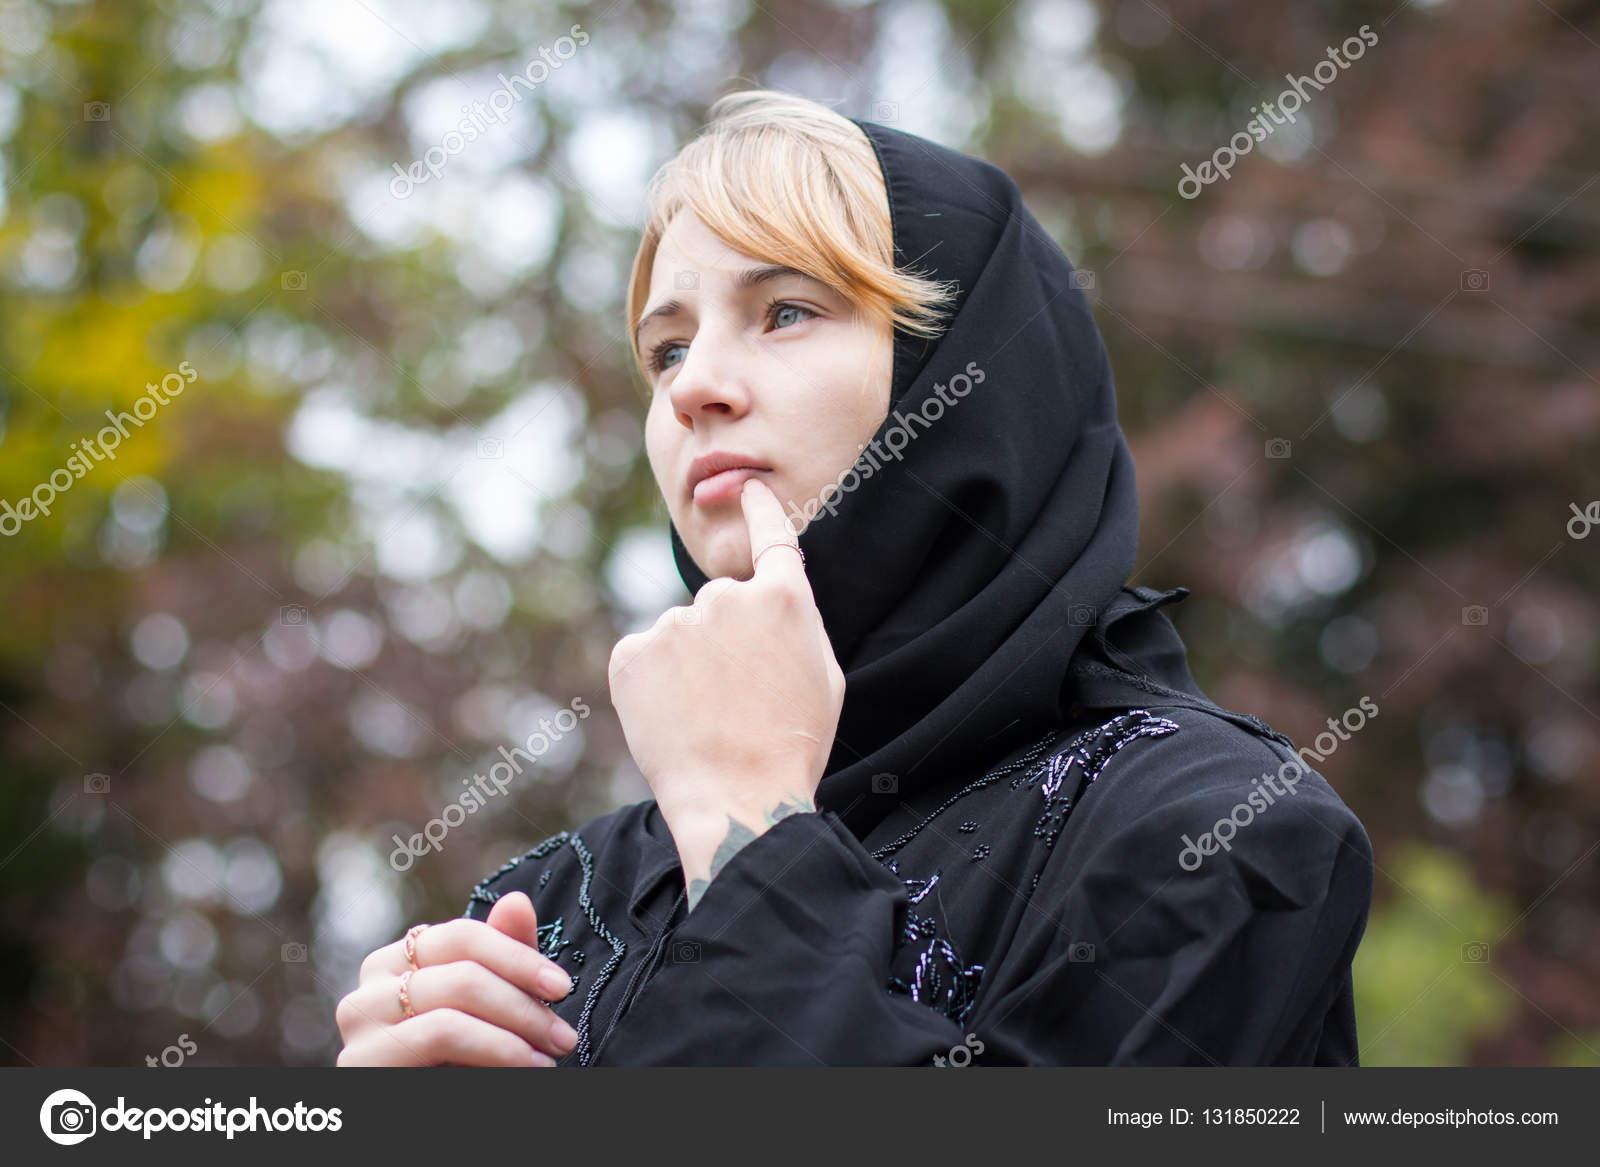 nice girl outdoor in an autumn — stock photo © keleny #131850222